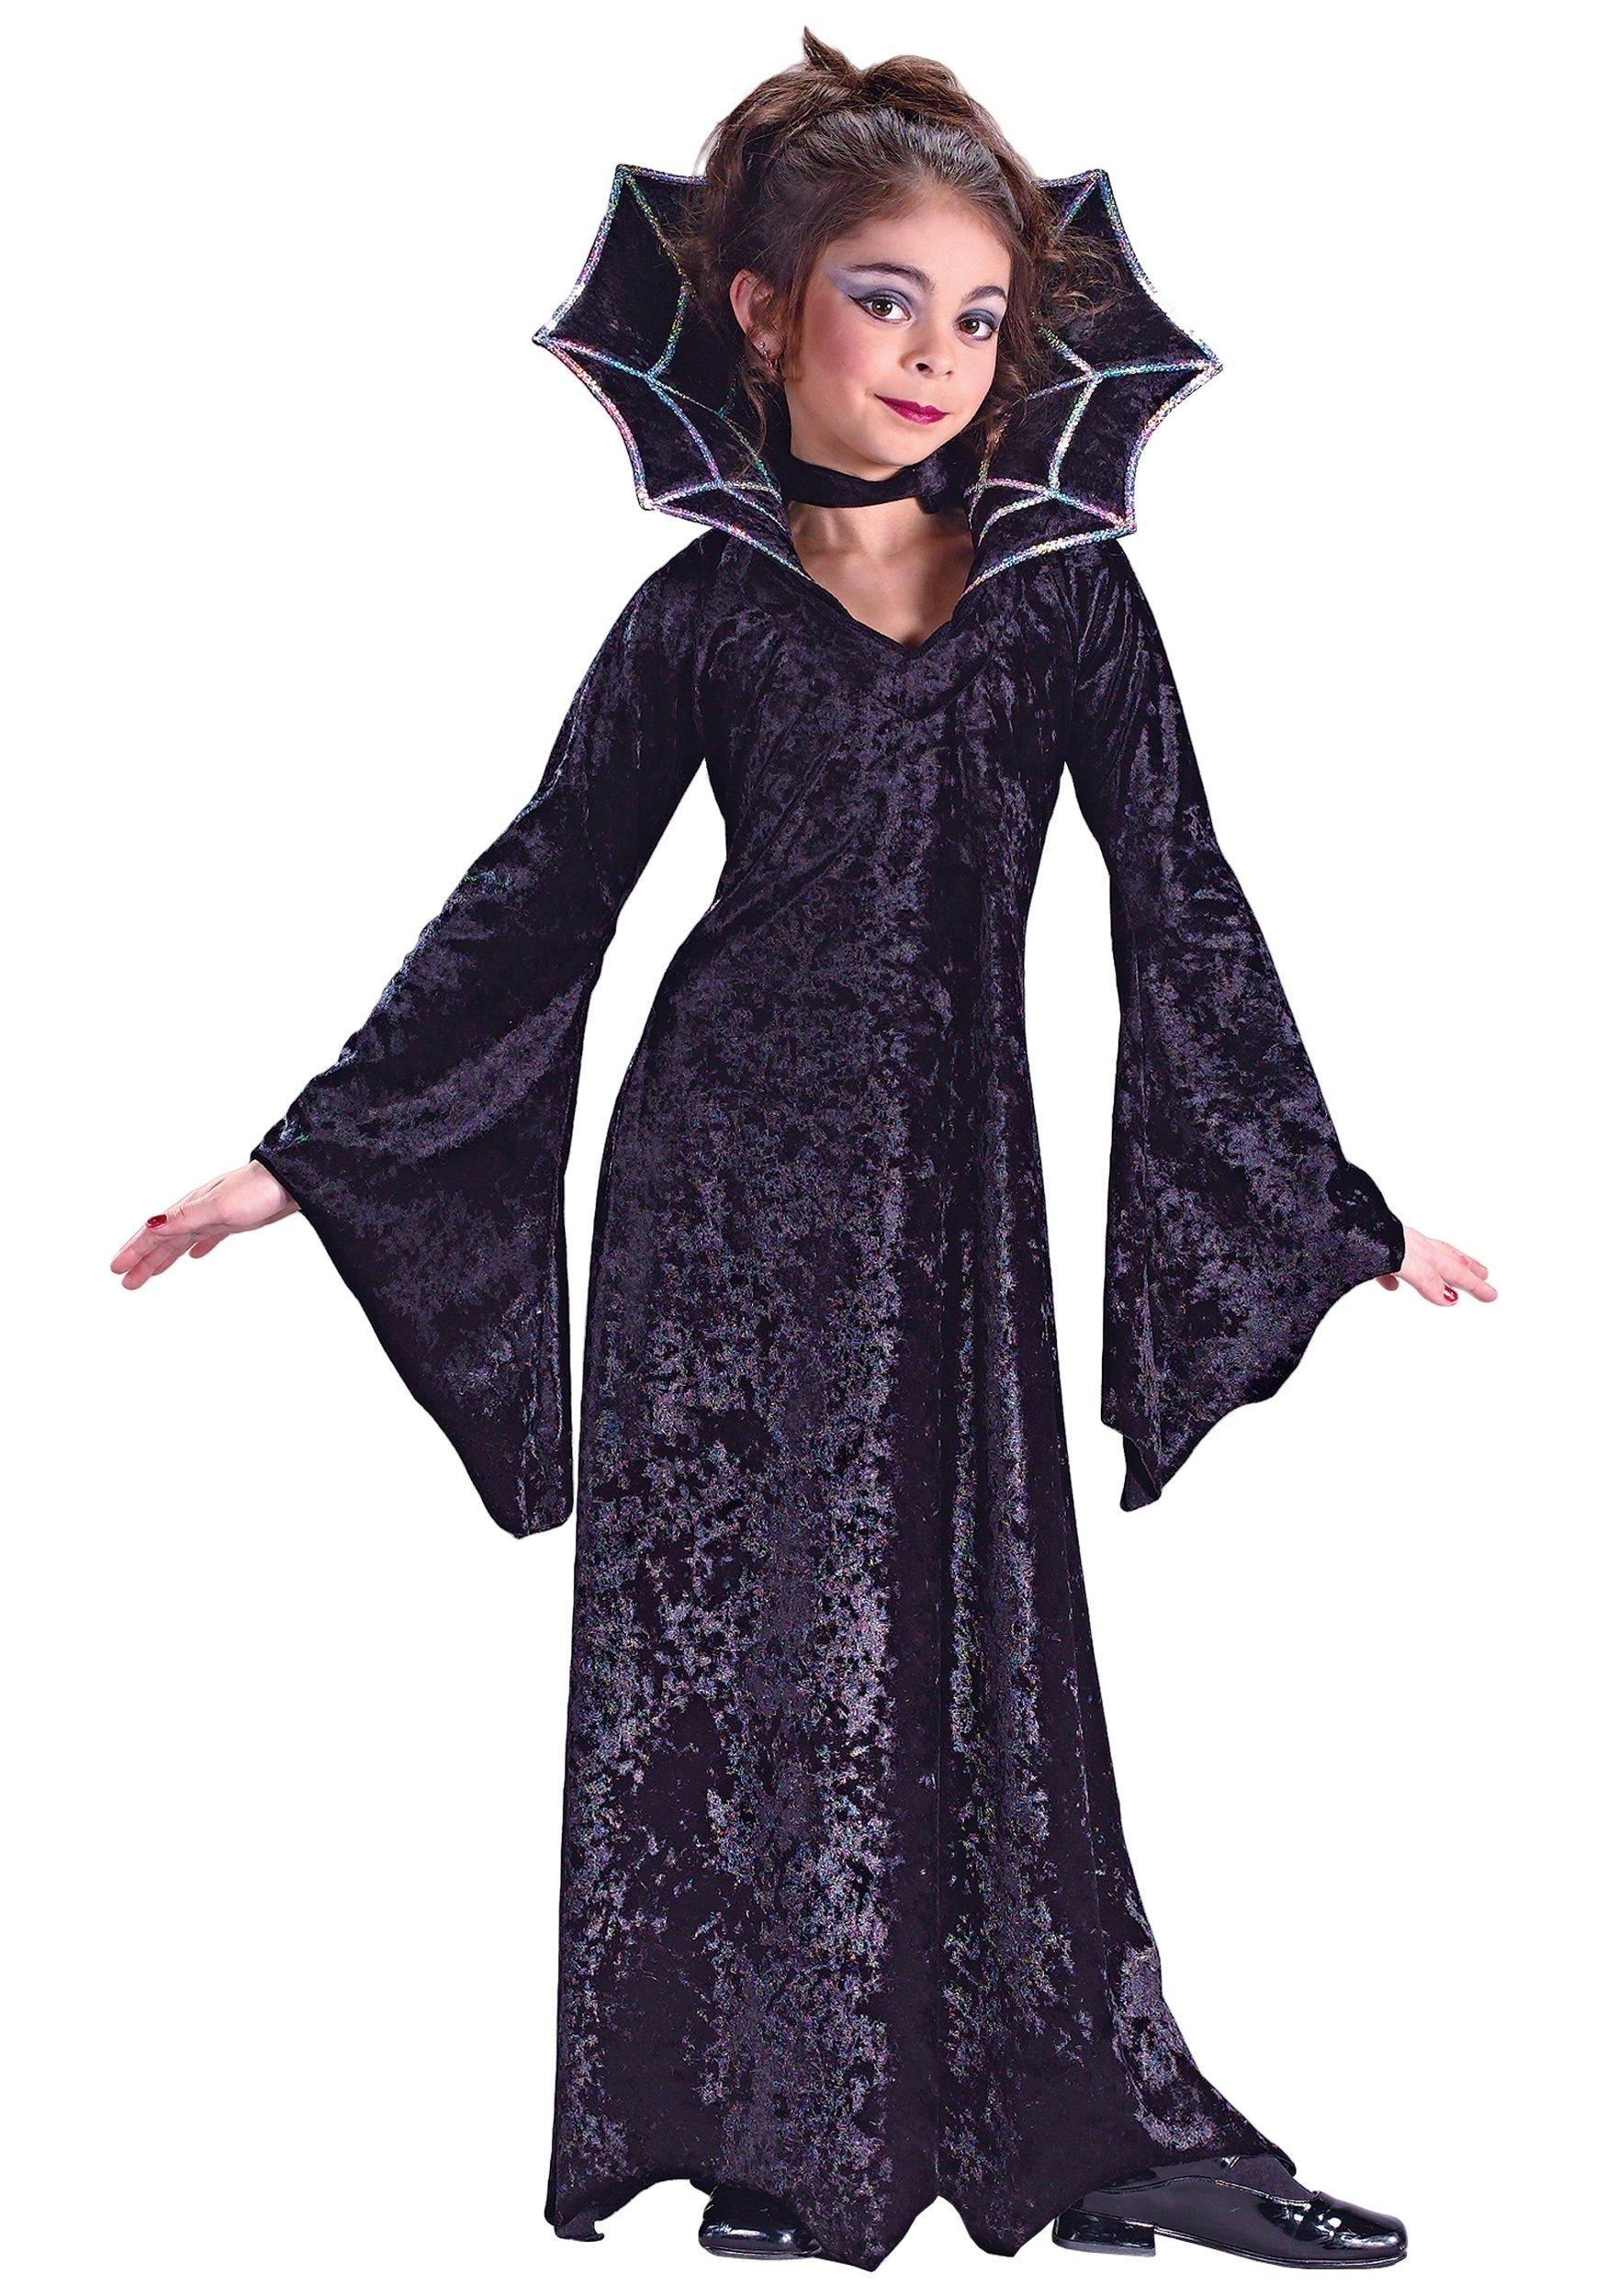 10 Ideal Halloween Costumes For Kids Ideas child spiderella costume 5 2021